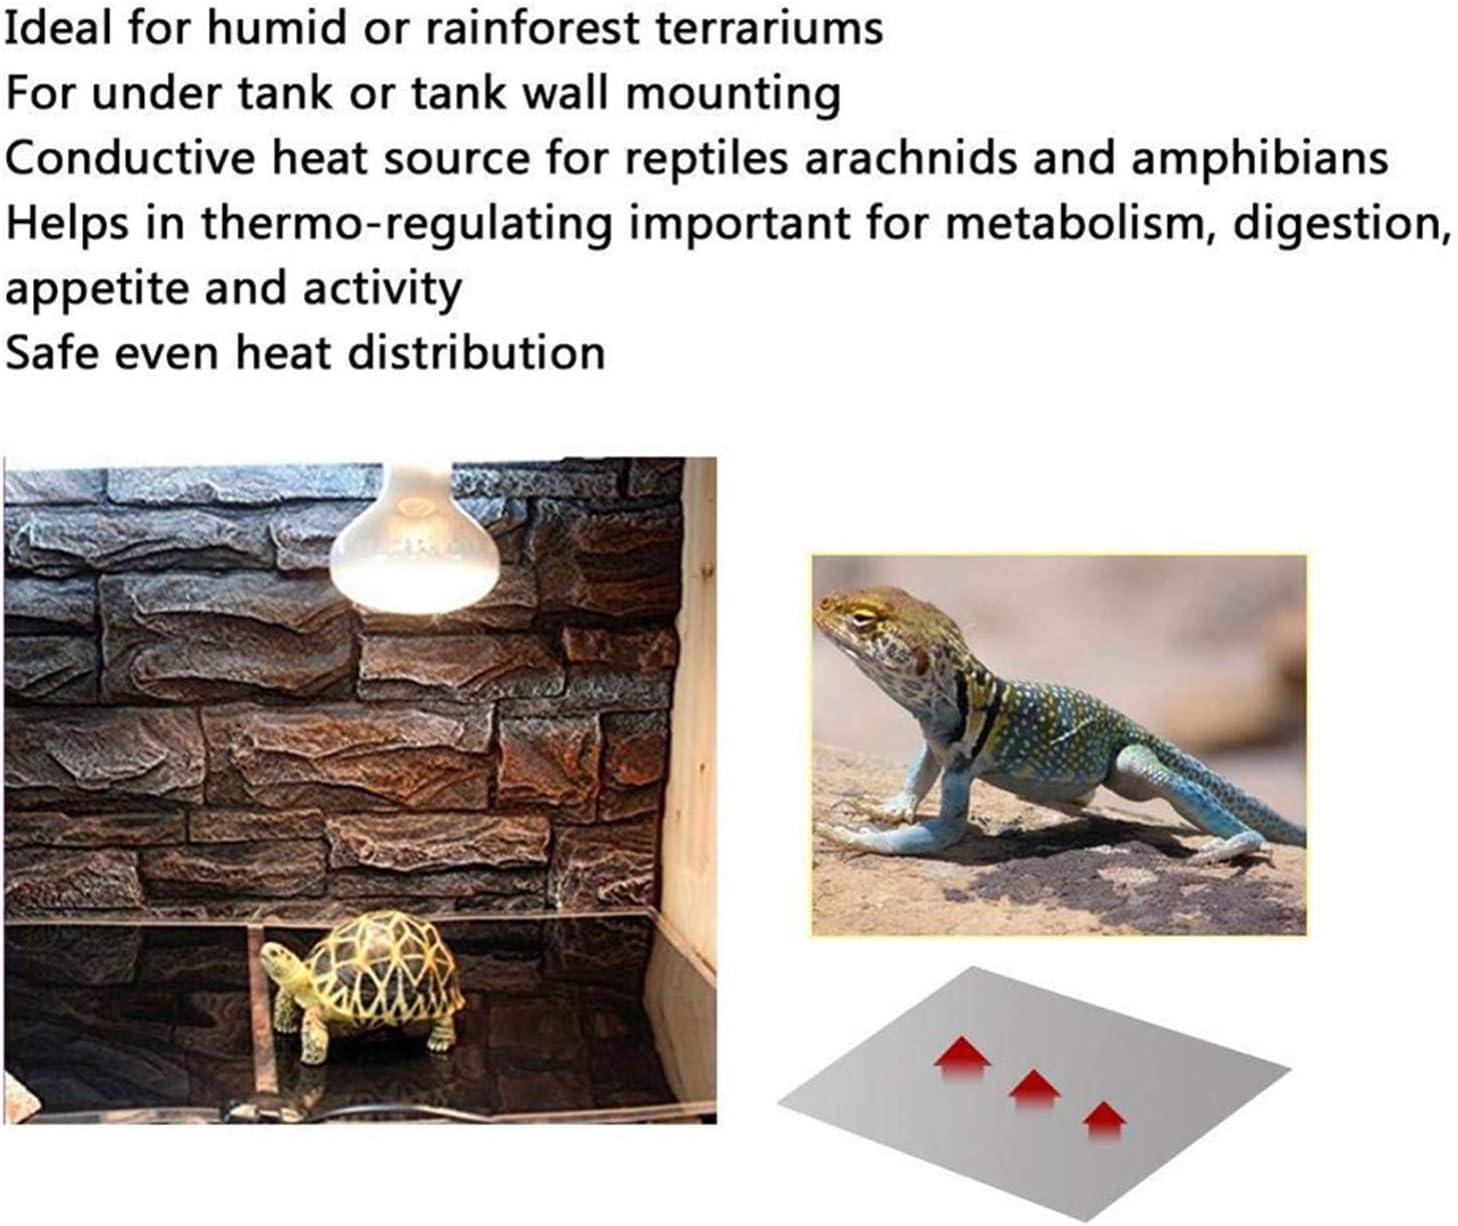 STARPIA Manta Termica para Reptiles, 5W 7W 14W 20W Manta Termica Calor Ajustable con Control De Temperatura, Reptil Almohadilla Térmica Reptil Heat Mat para Anfibios Invertebrado Terrarios (20W): Amazon.es: Jardín